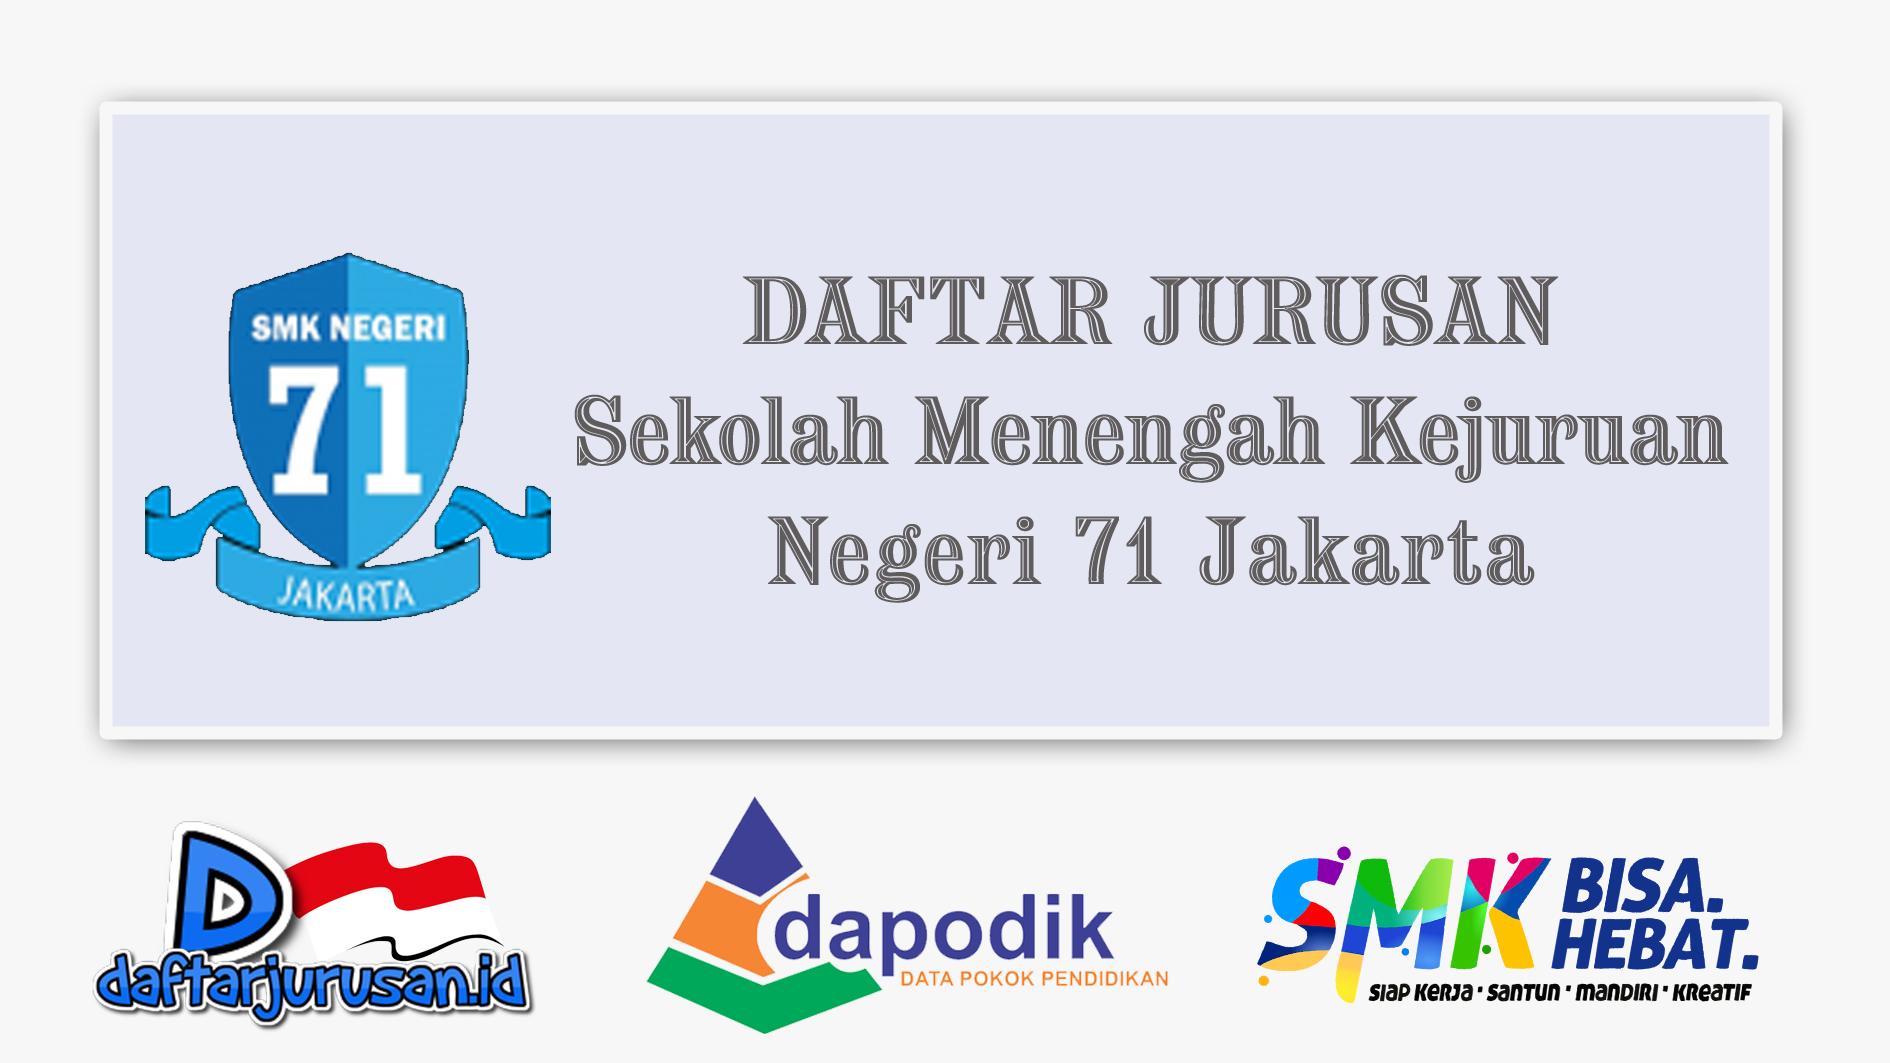 Daftar Jurusan SMK Negeri 71 Jakarta Timur